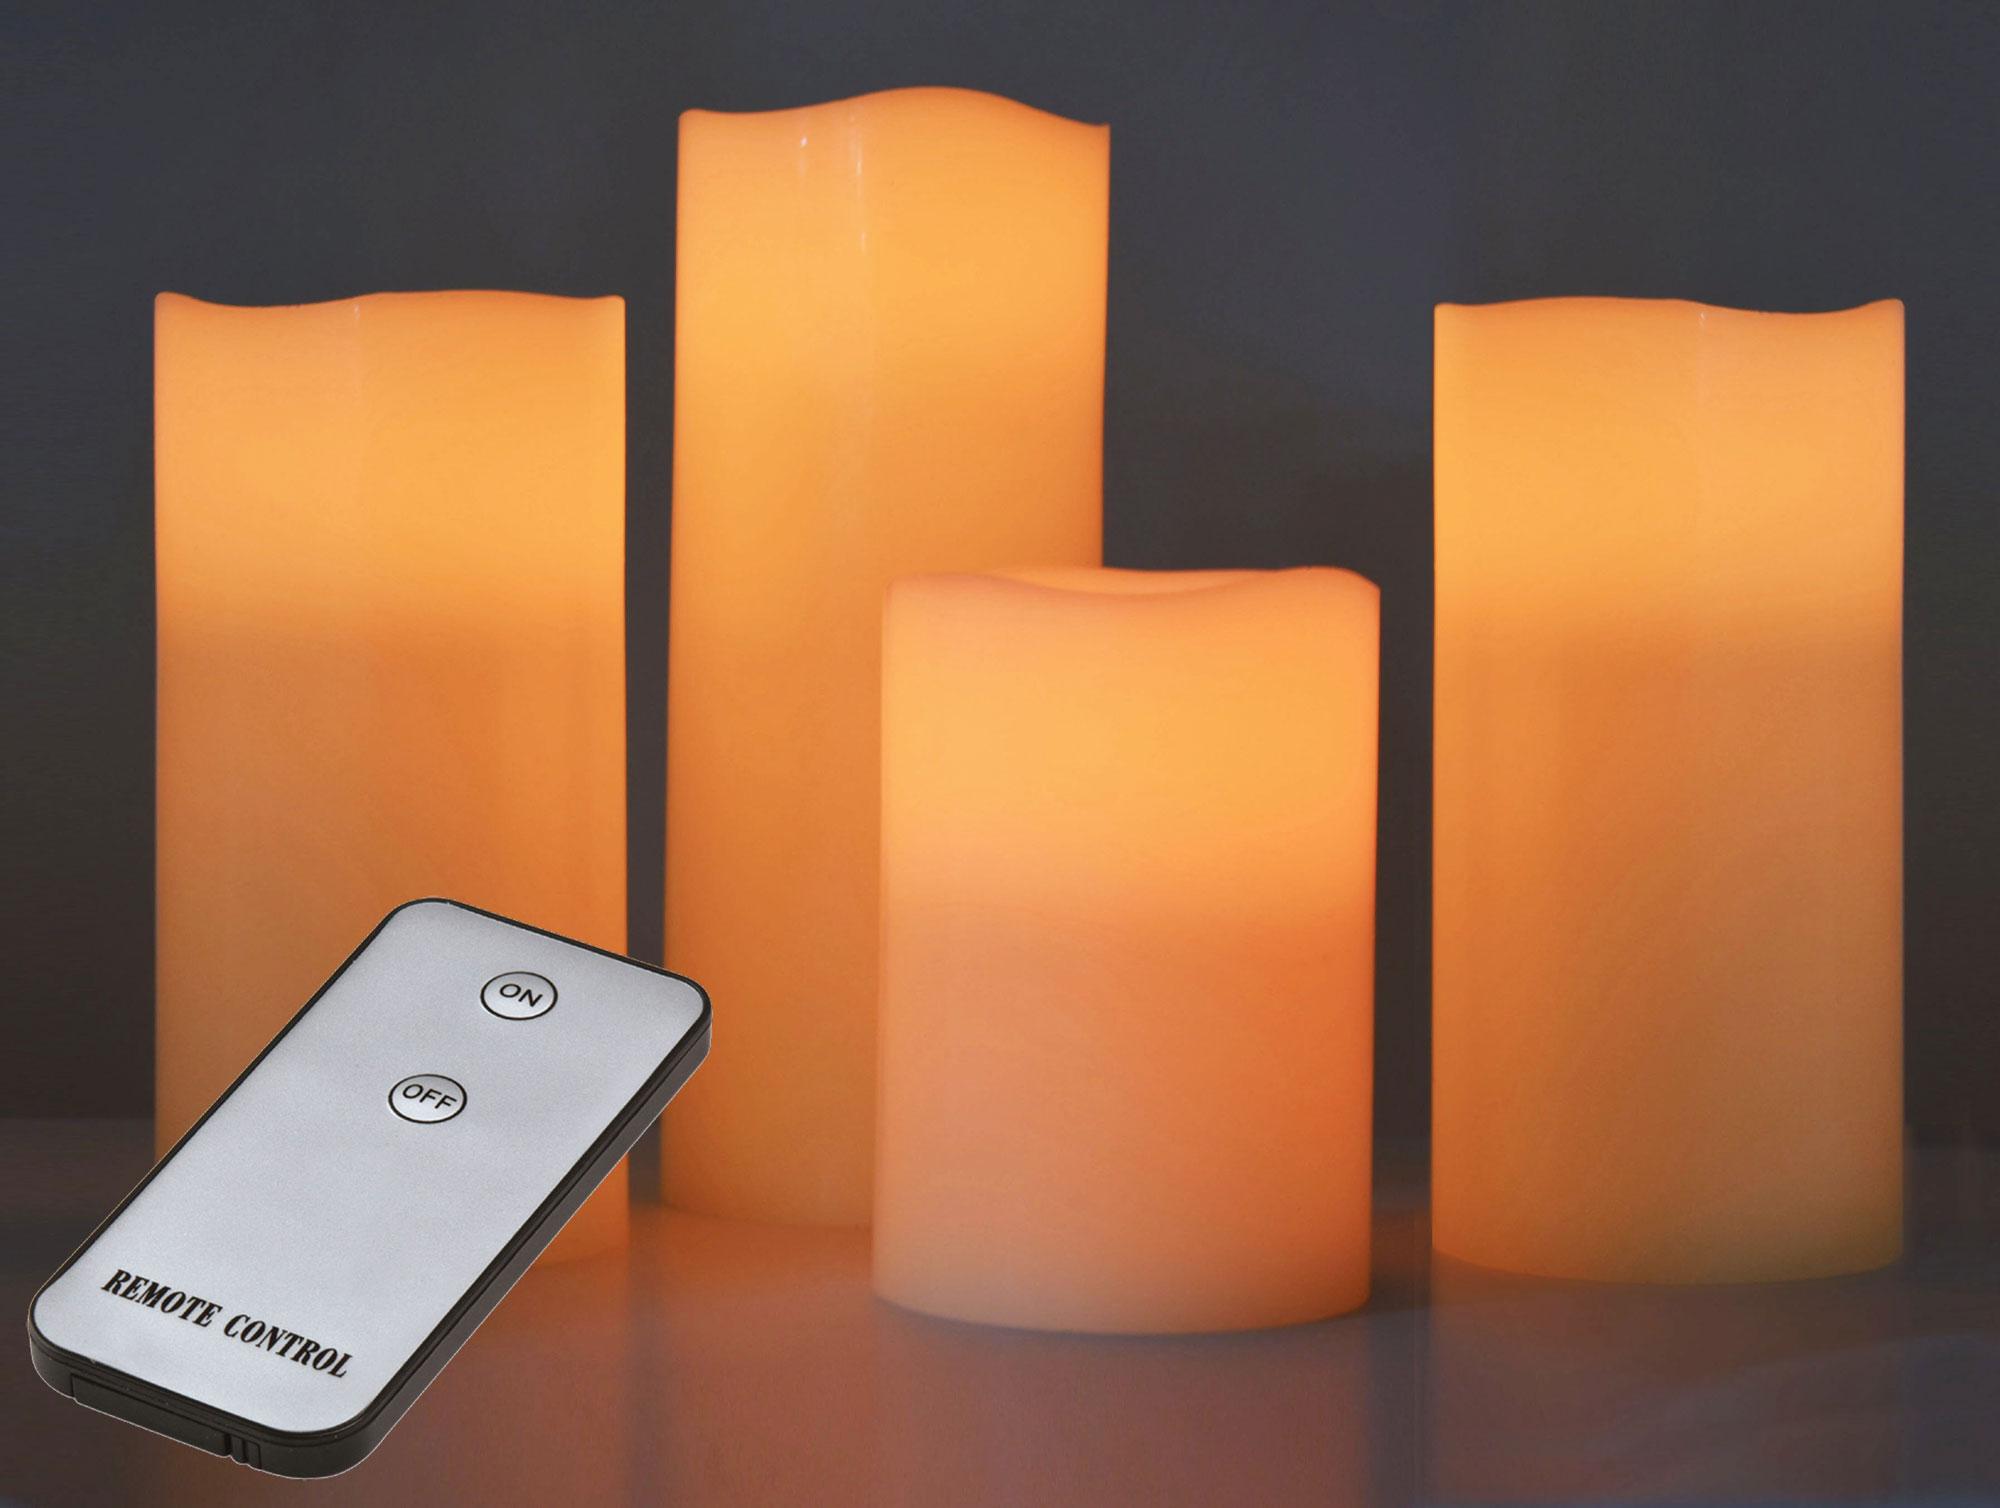 X4-LIFE LED Echtwachskerzen 4er Set inkl. Fernbedienung Bild 2